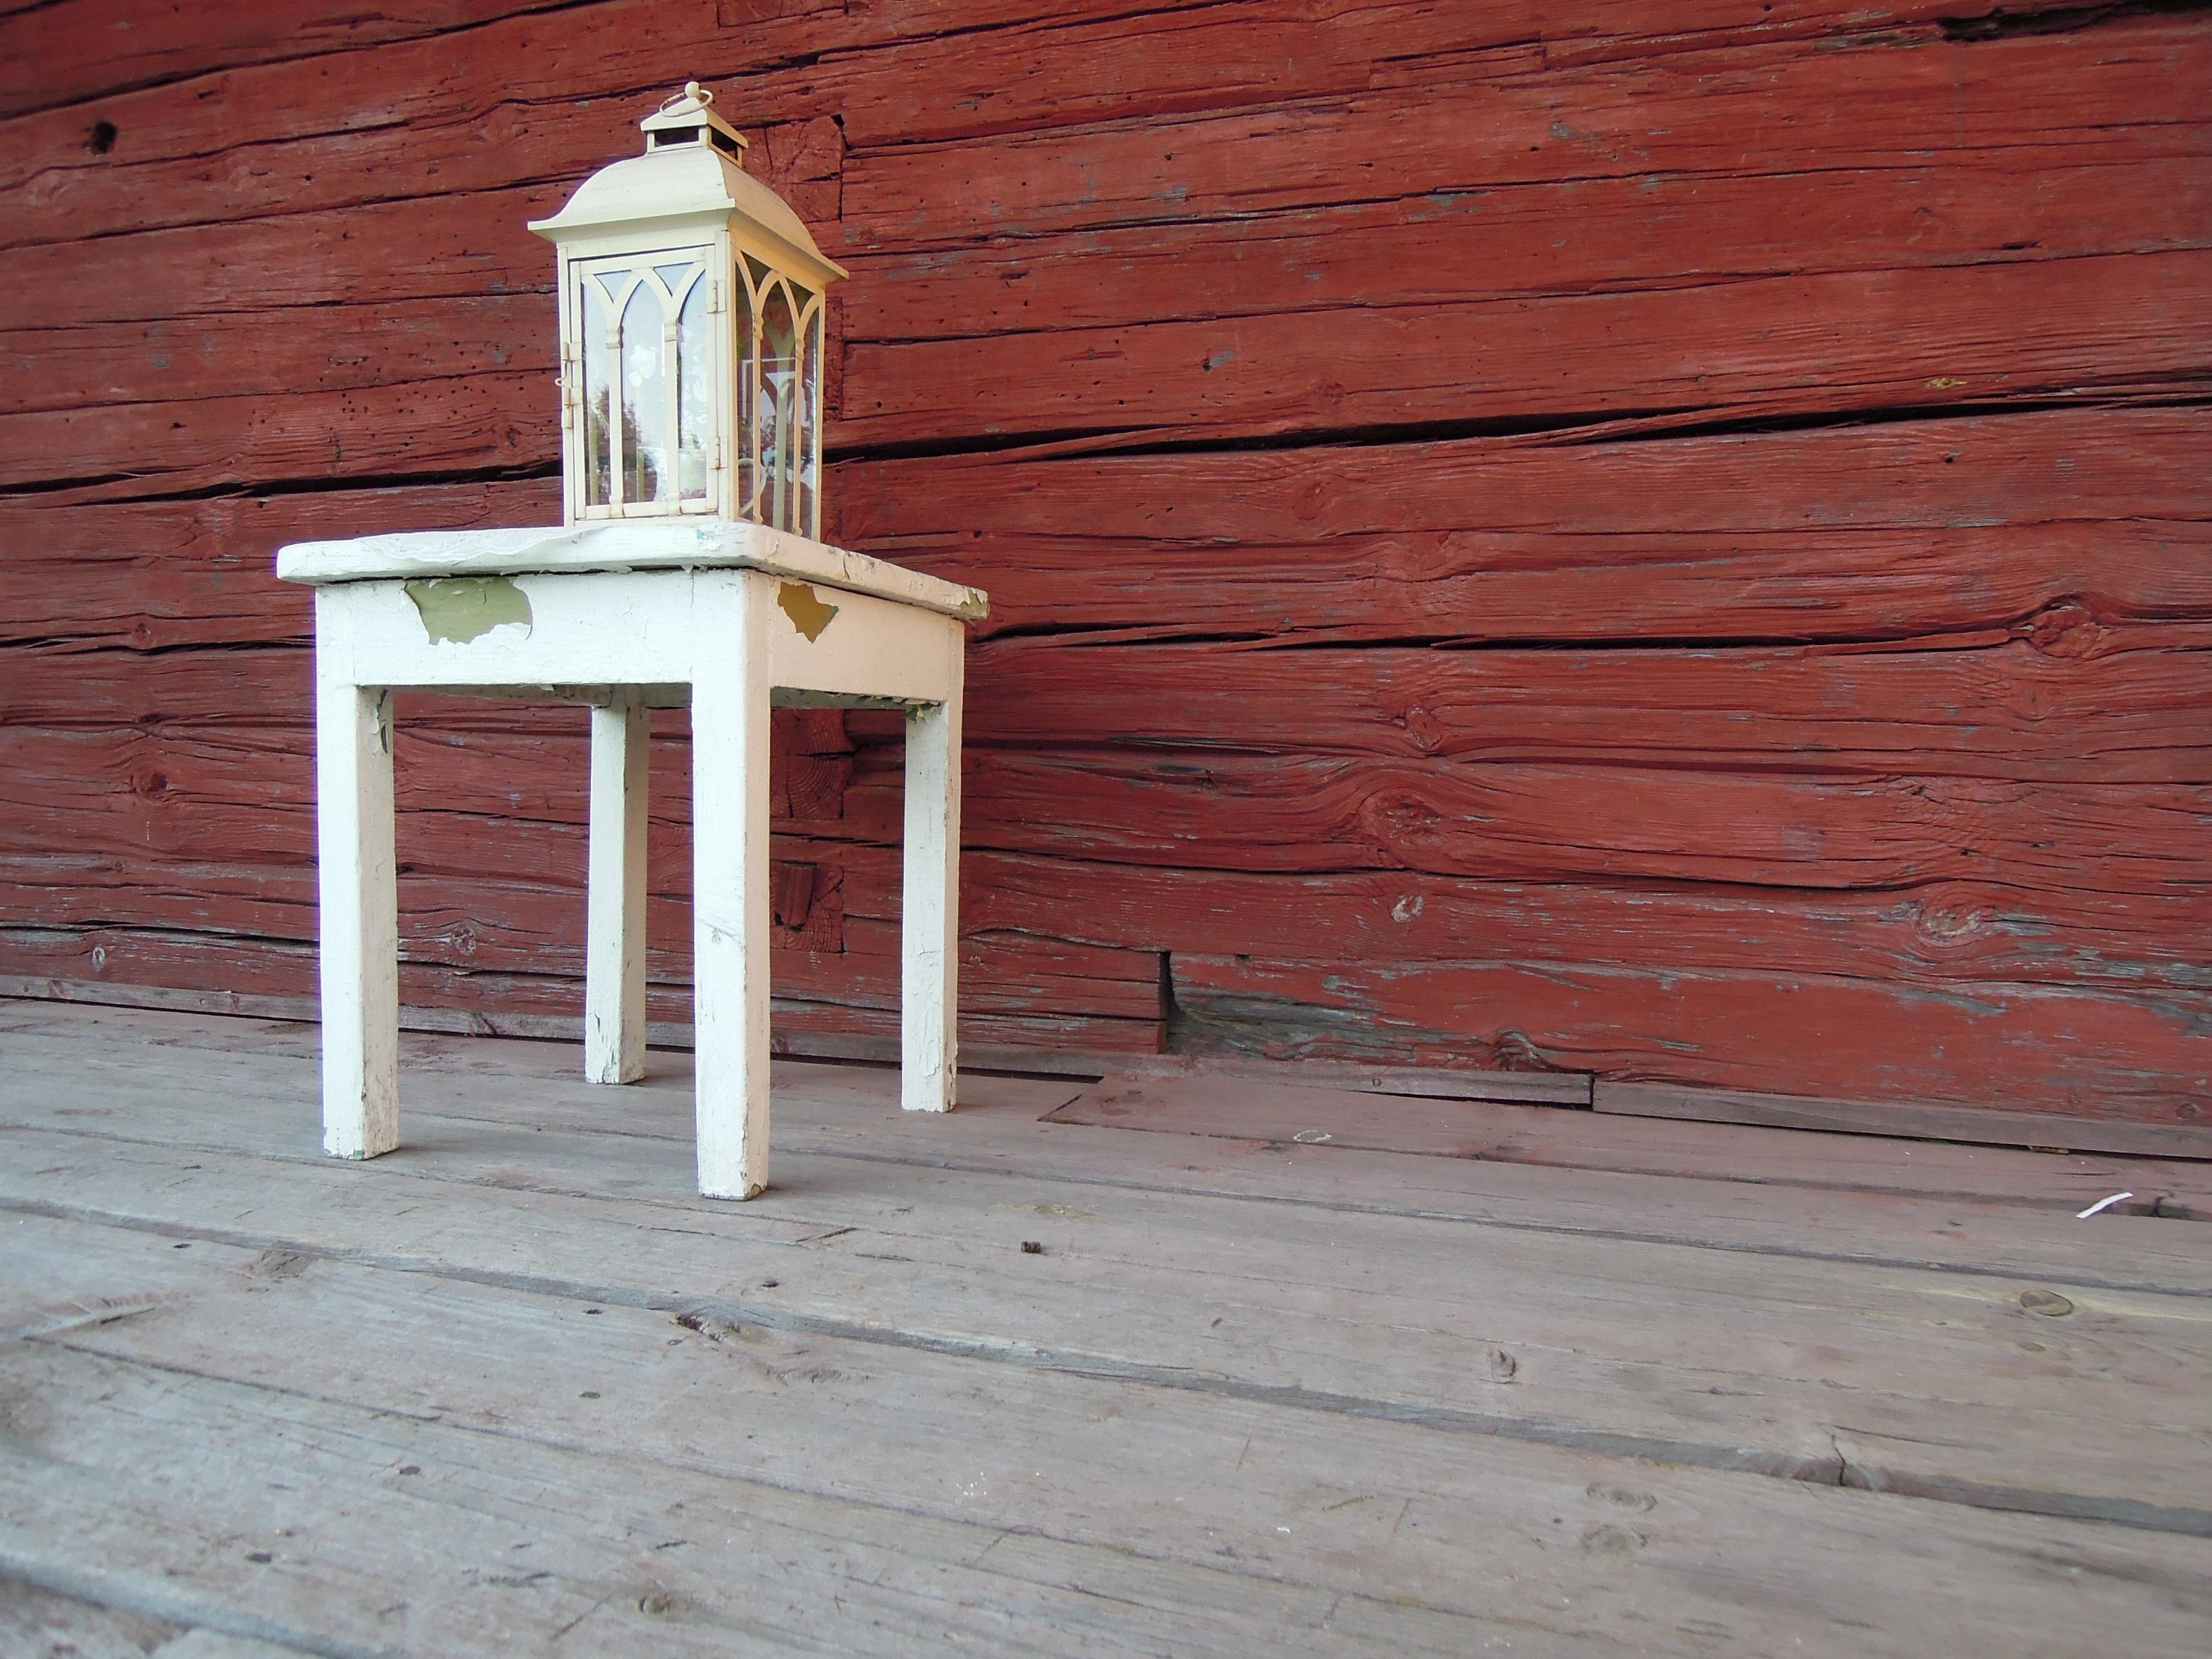 Fotos gratis : estructura, madera, blanco, casa, silla, piso ...